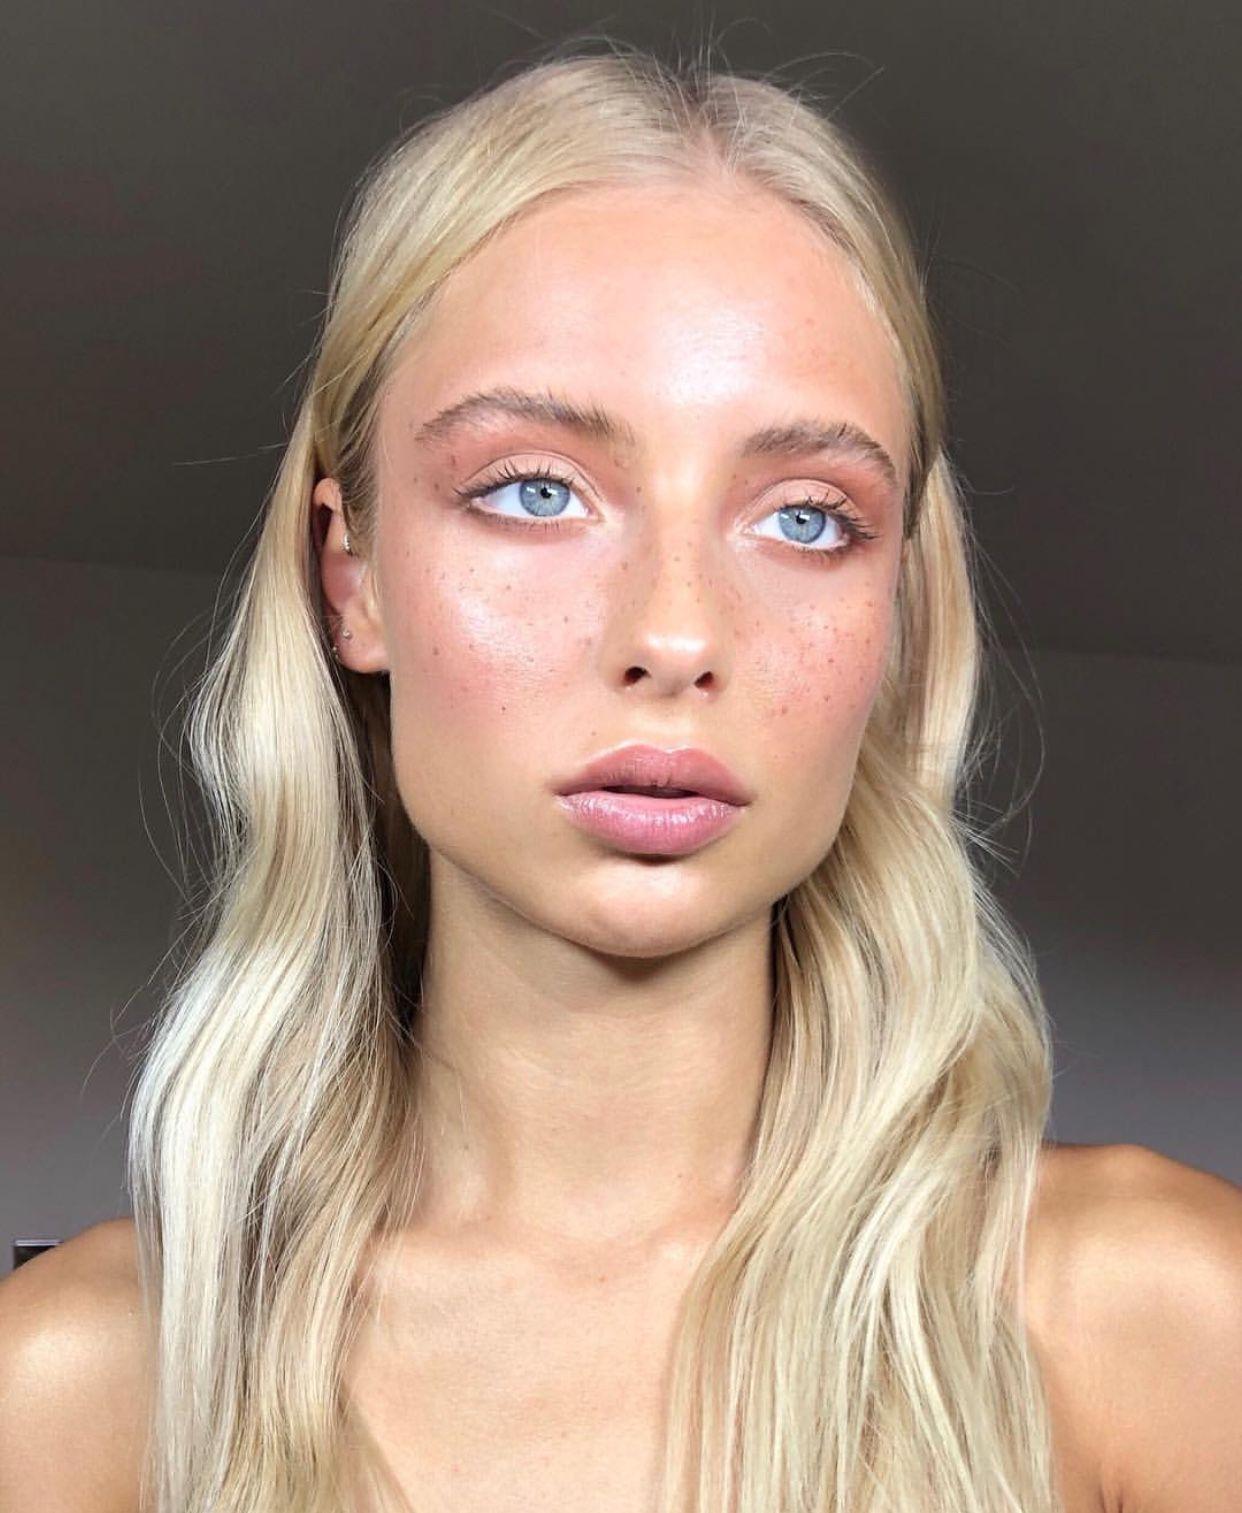 Pin By Moњa Tadiћ On Makeup In 2020 Light Blonde Hair Makeup Looks Natural Makeup